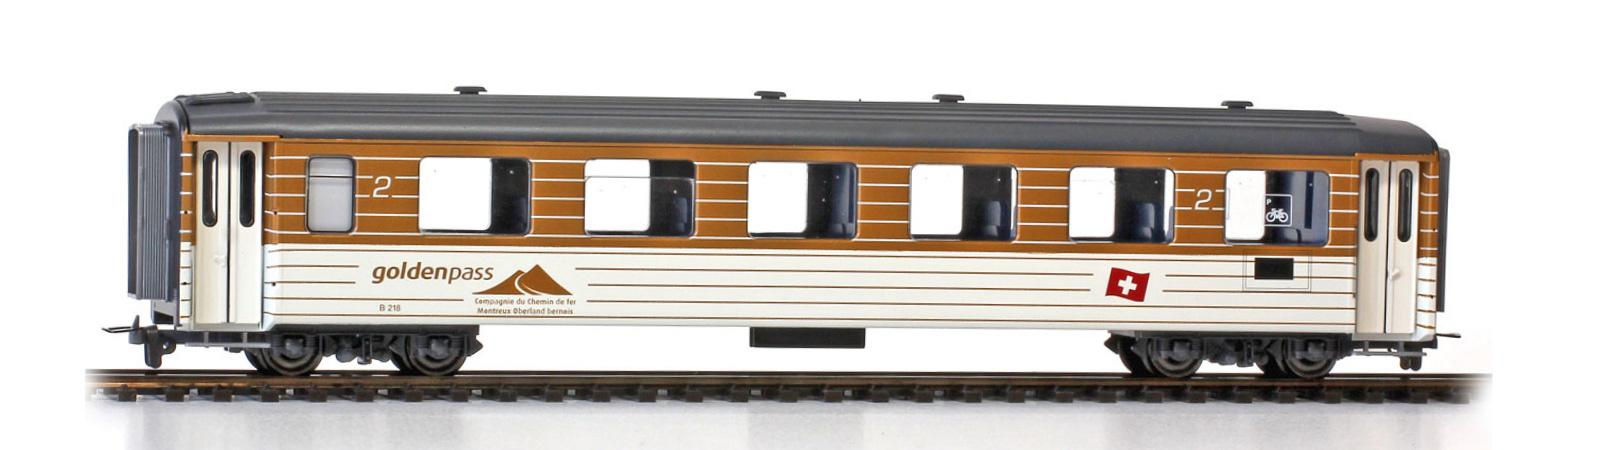 "3292348 MOB B 218 Personenwagen ""goldenpass""-1"